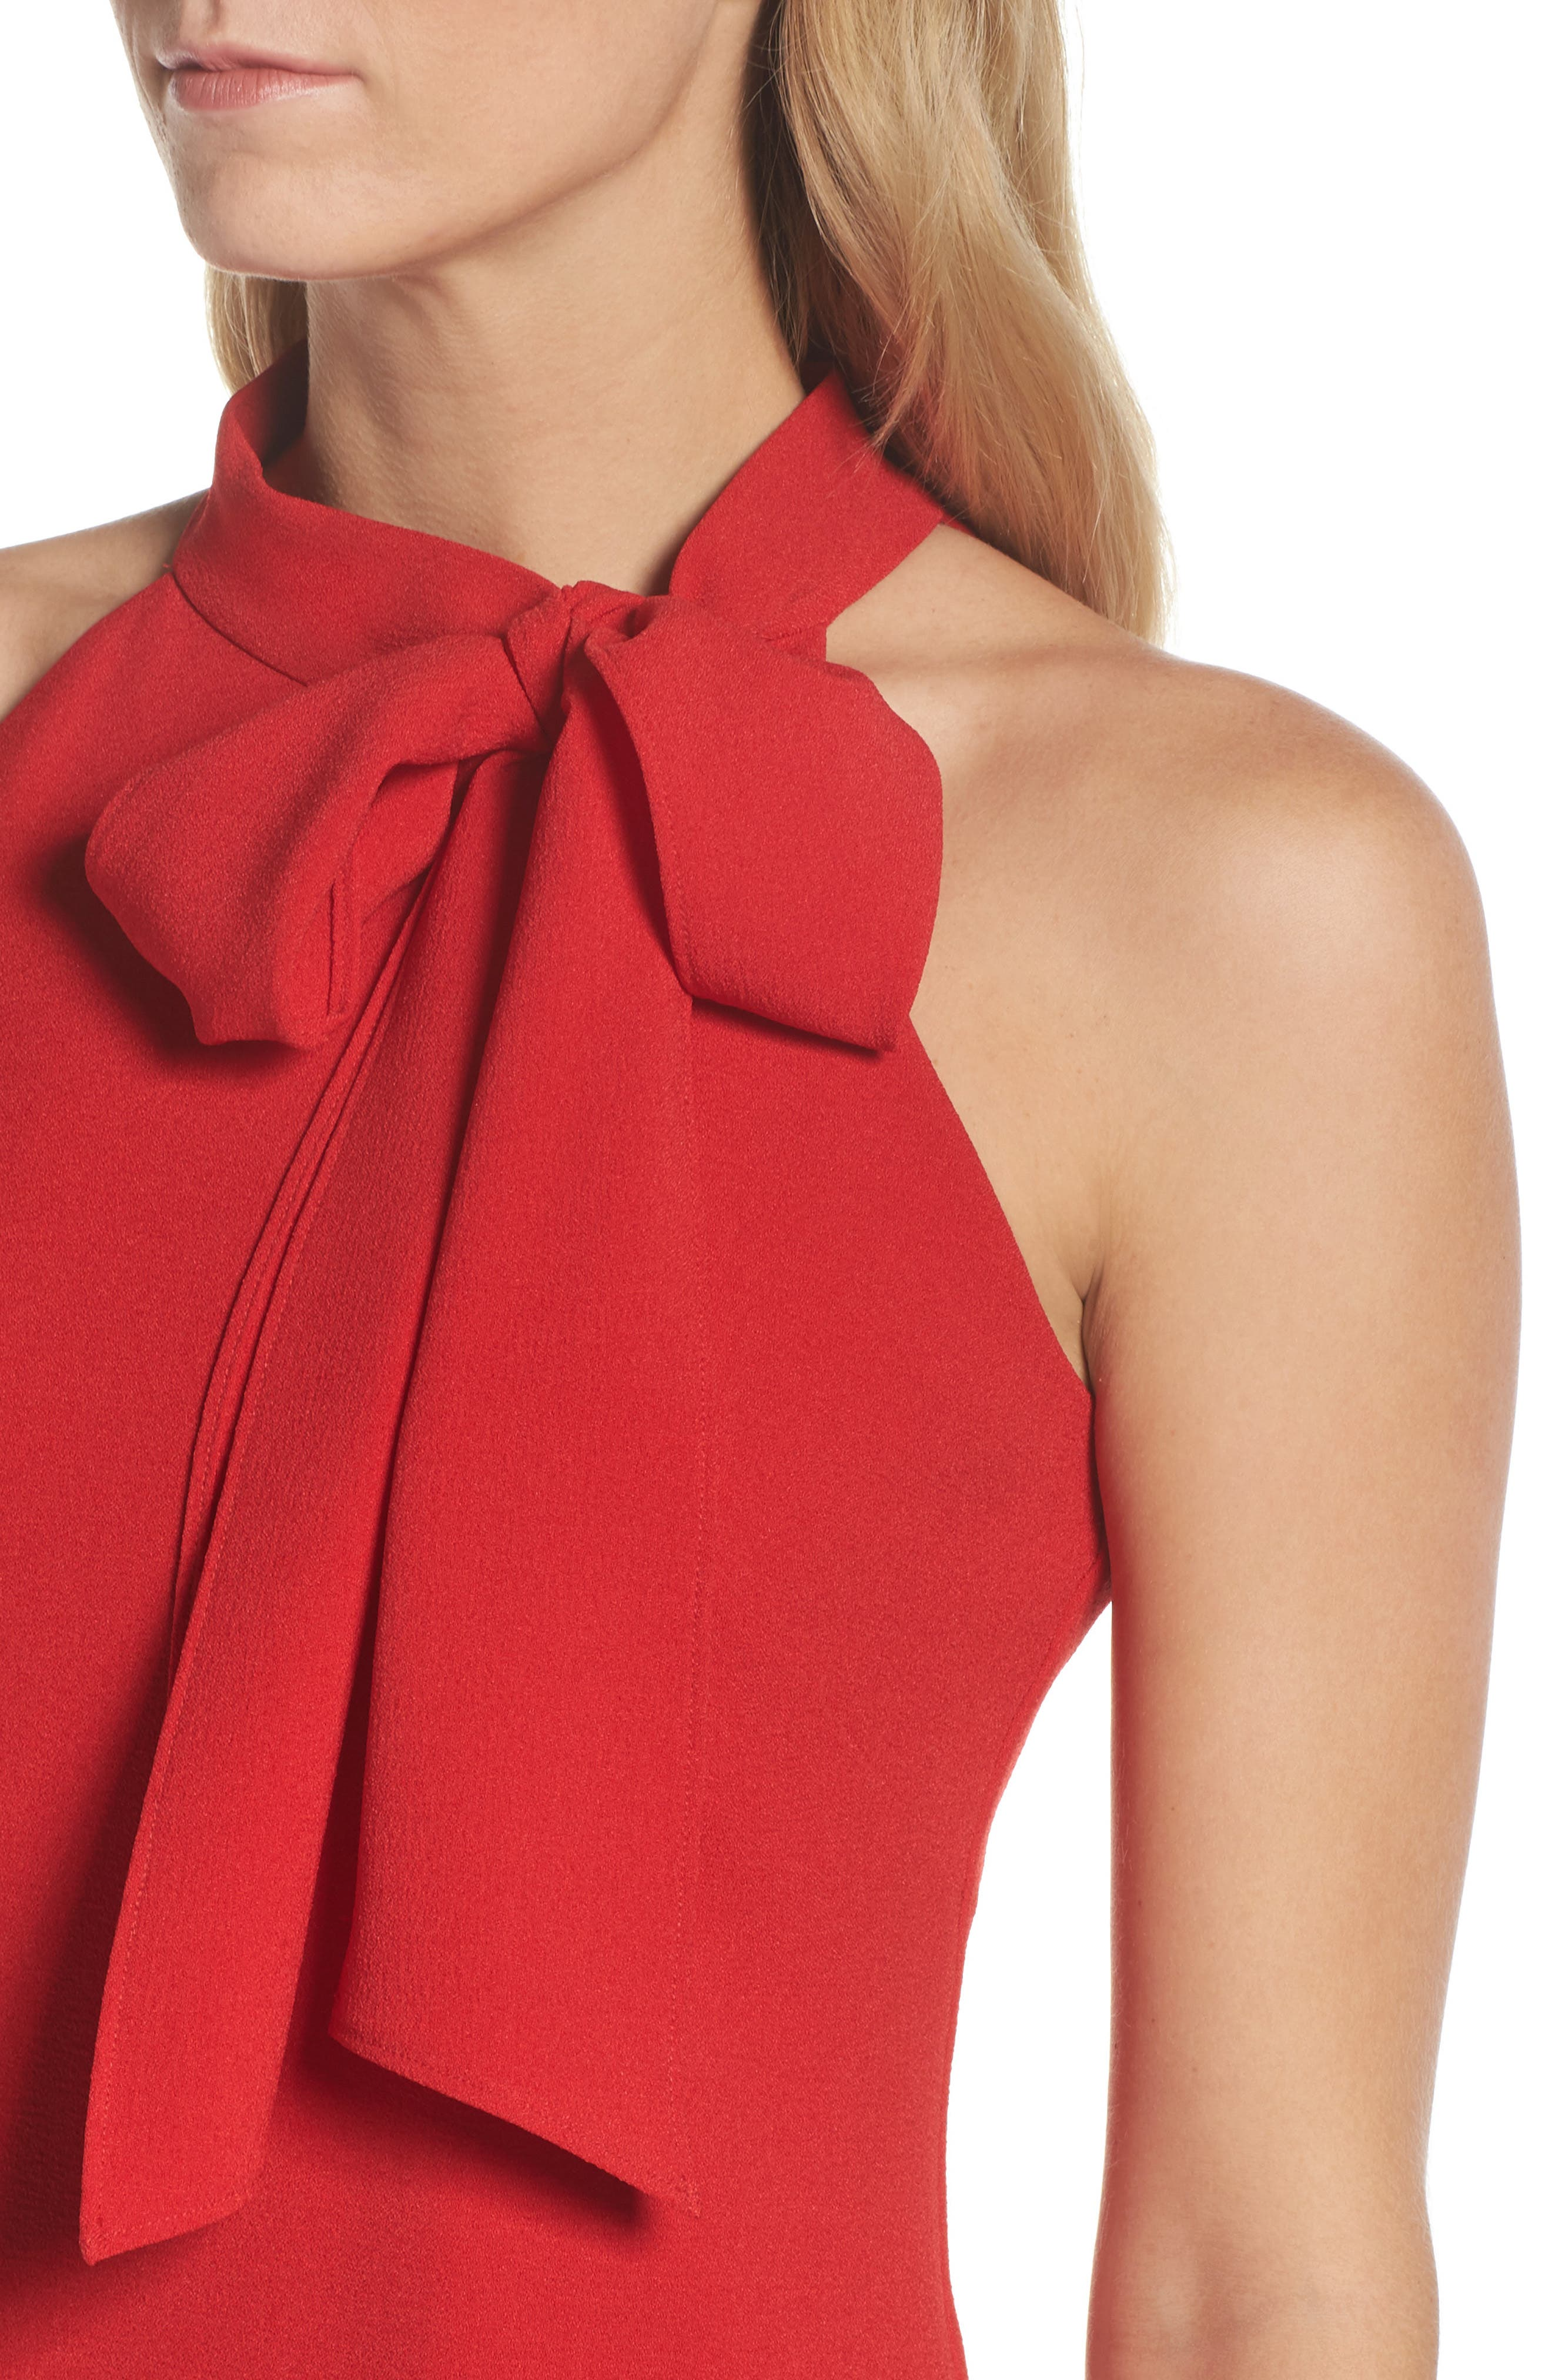 VINCE CAMUTO, Halter Tie Neck A-Line Dress, Alternate thumbnail 5, color, RED